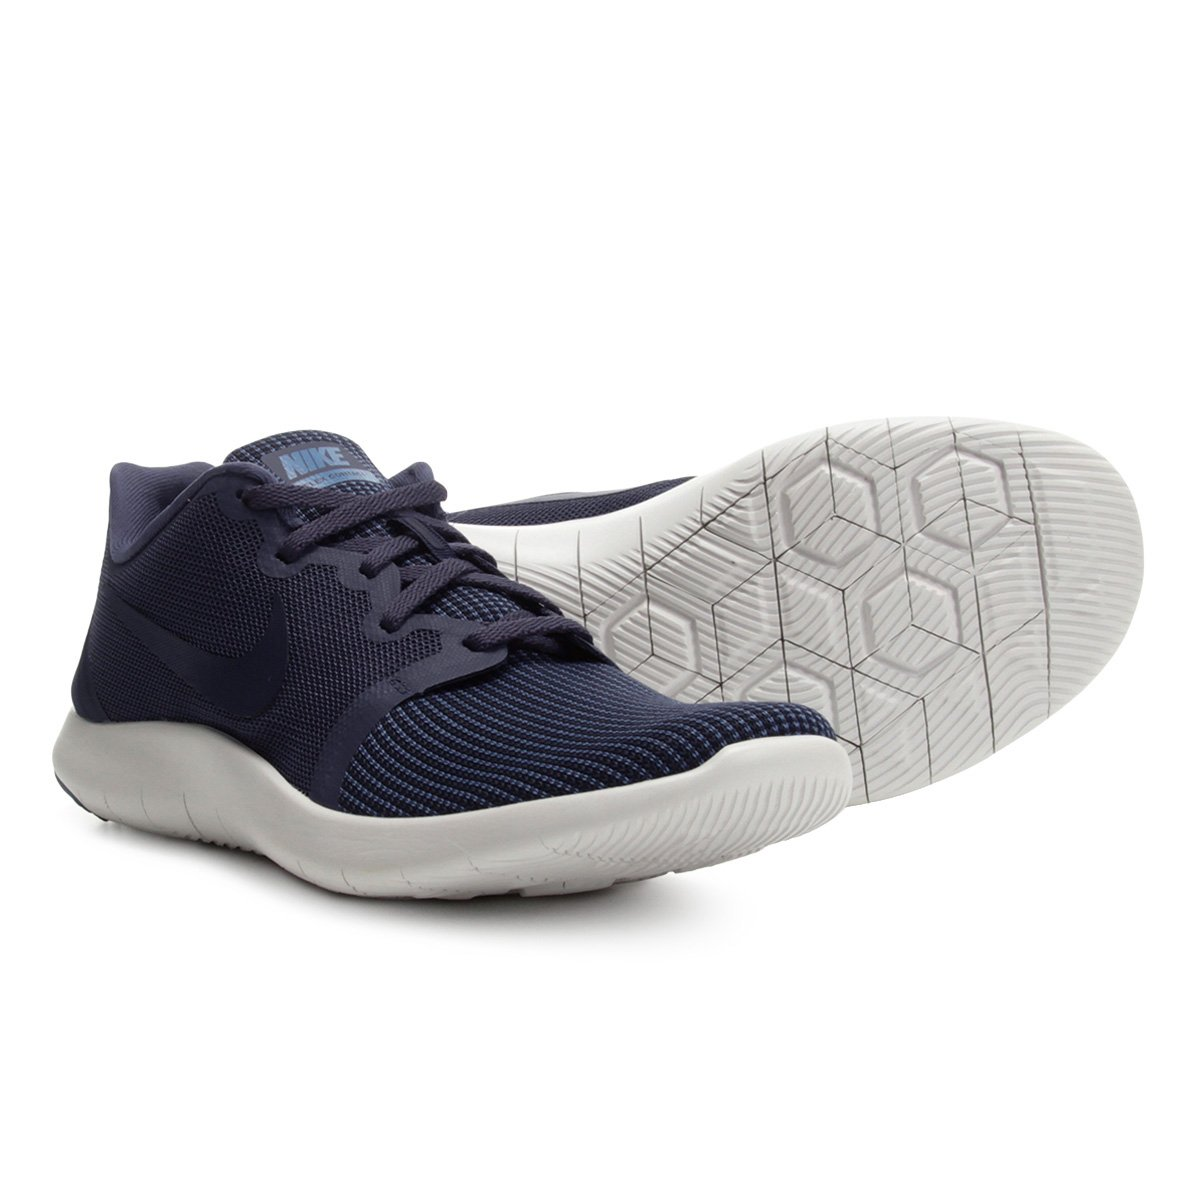 1cc0a264a7c Tênis Nike Flex Contact 2 Masculino - Azul - Compre Agora